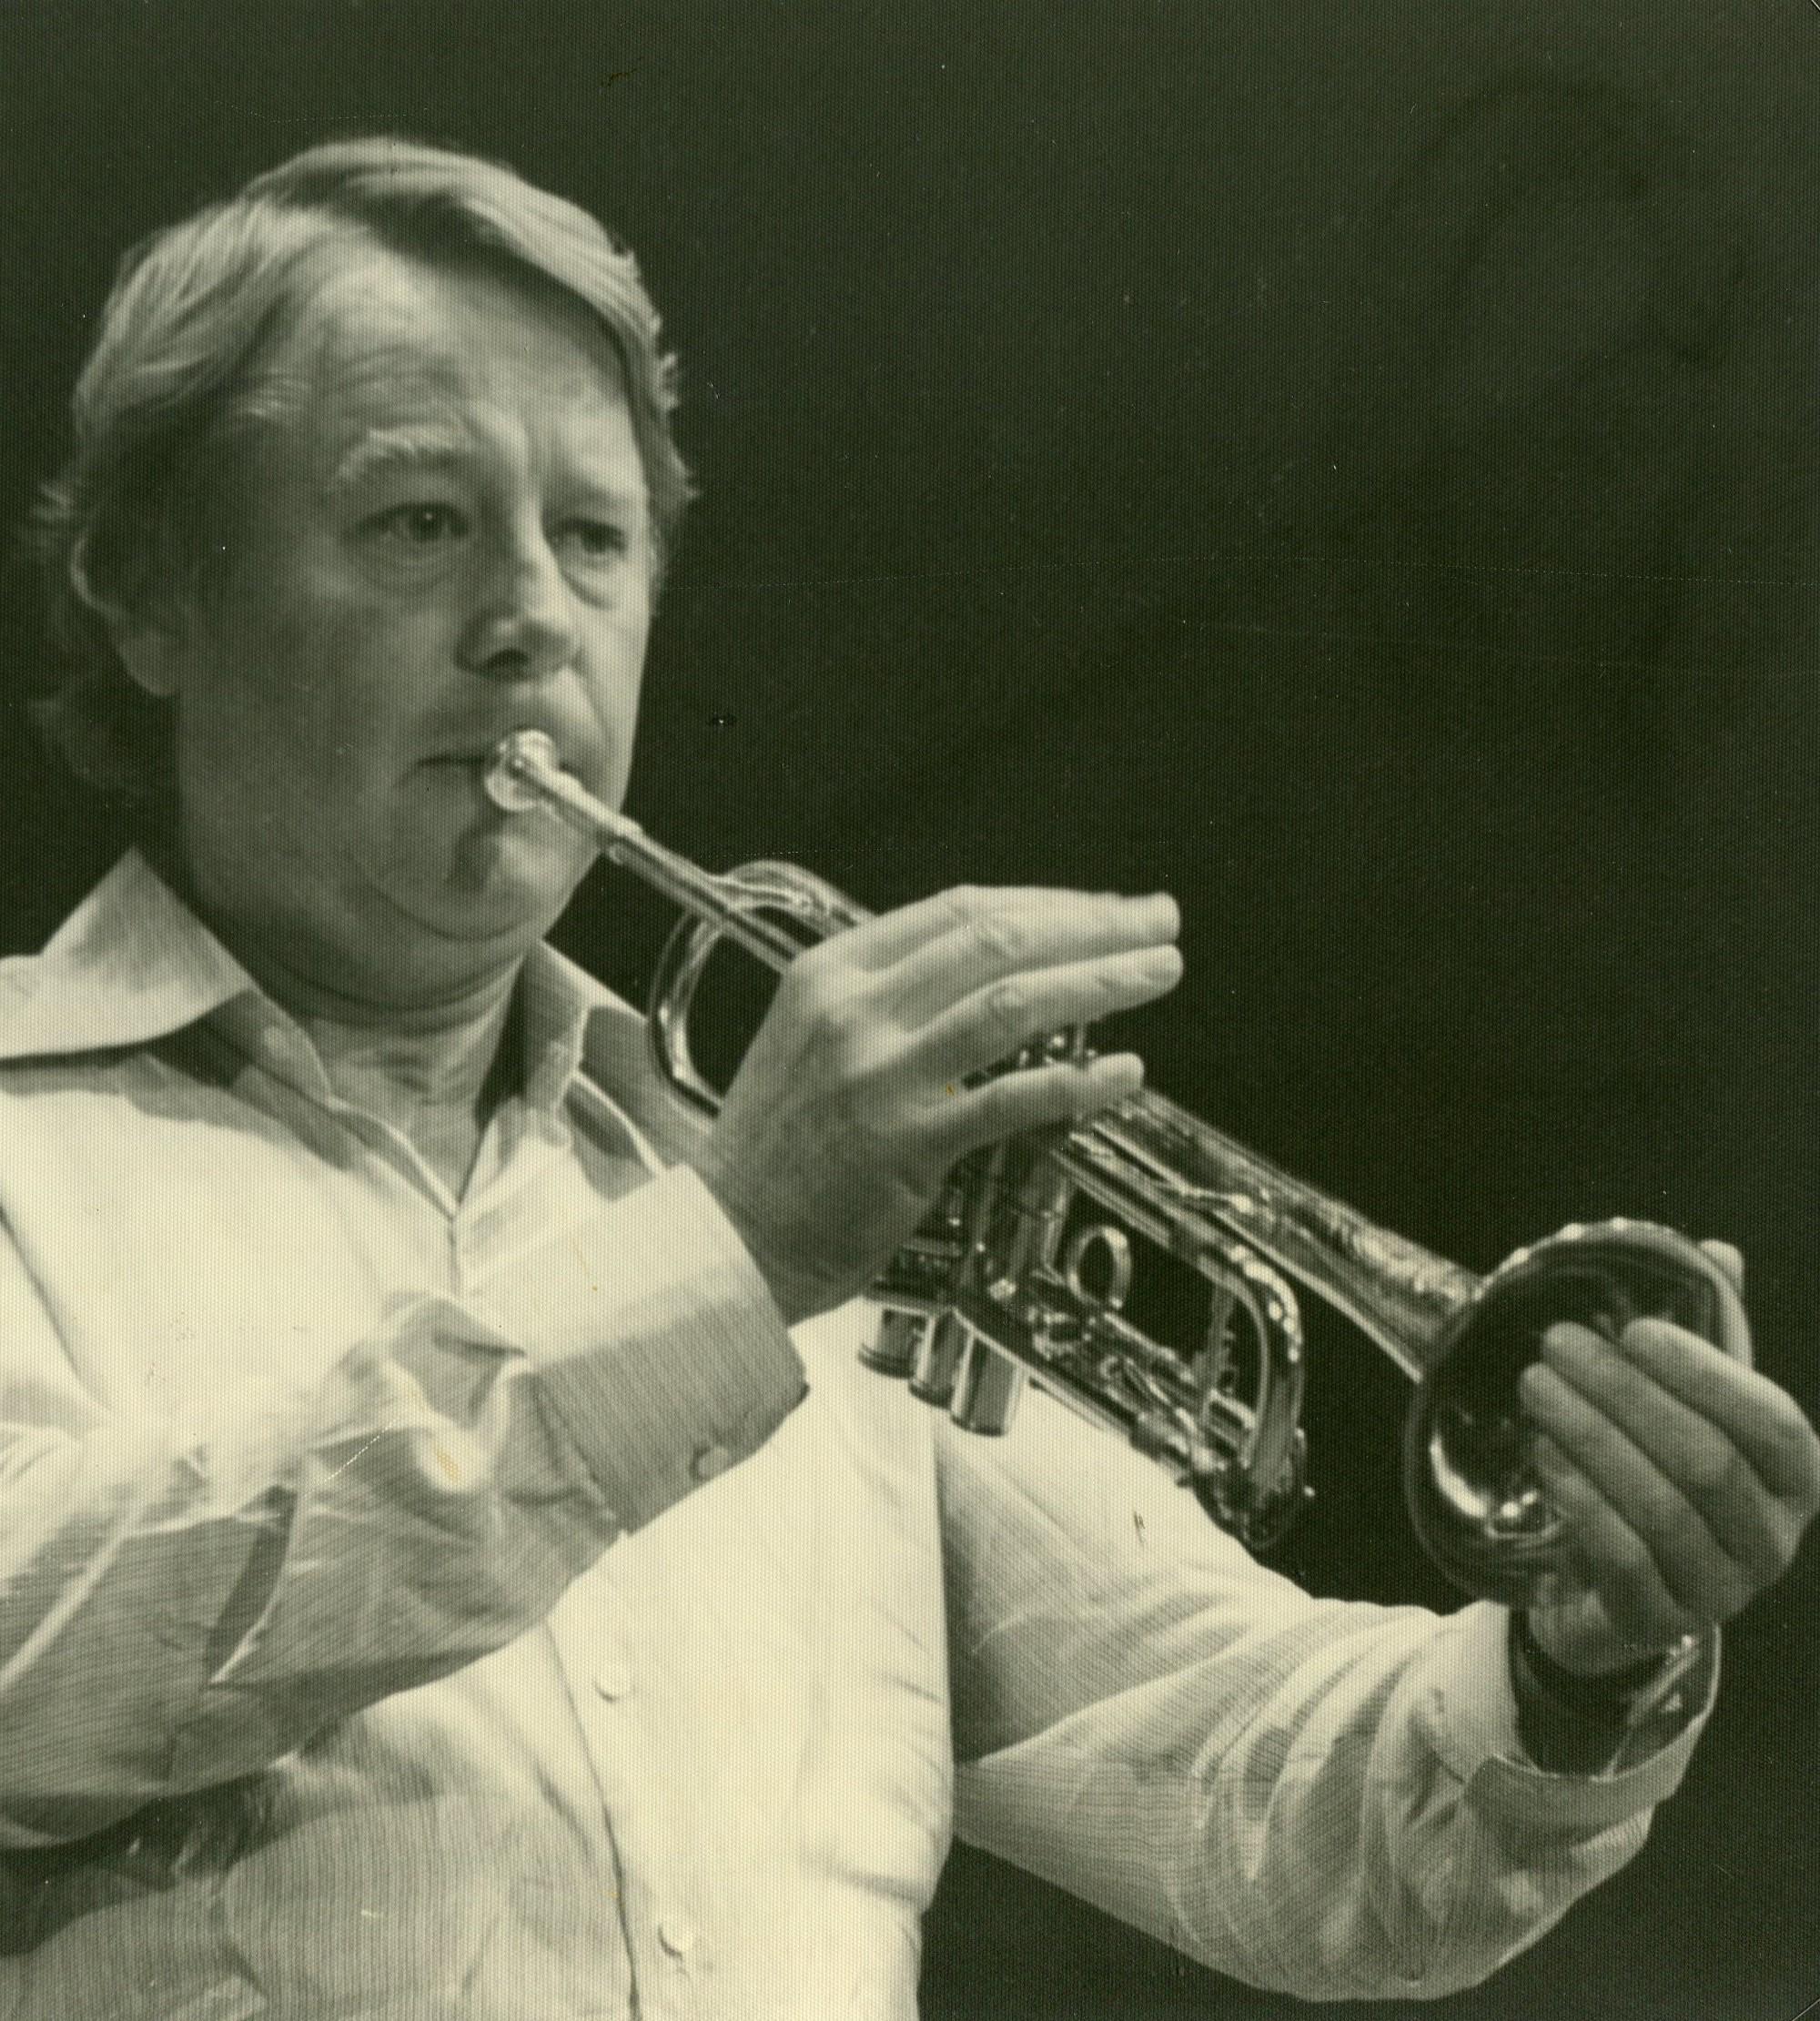 Photo courtesy Australian Jazz Museum